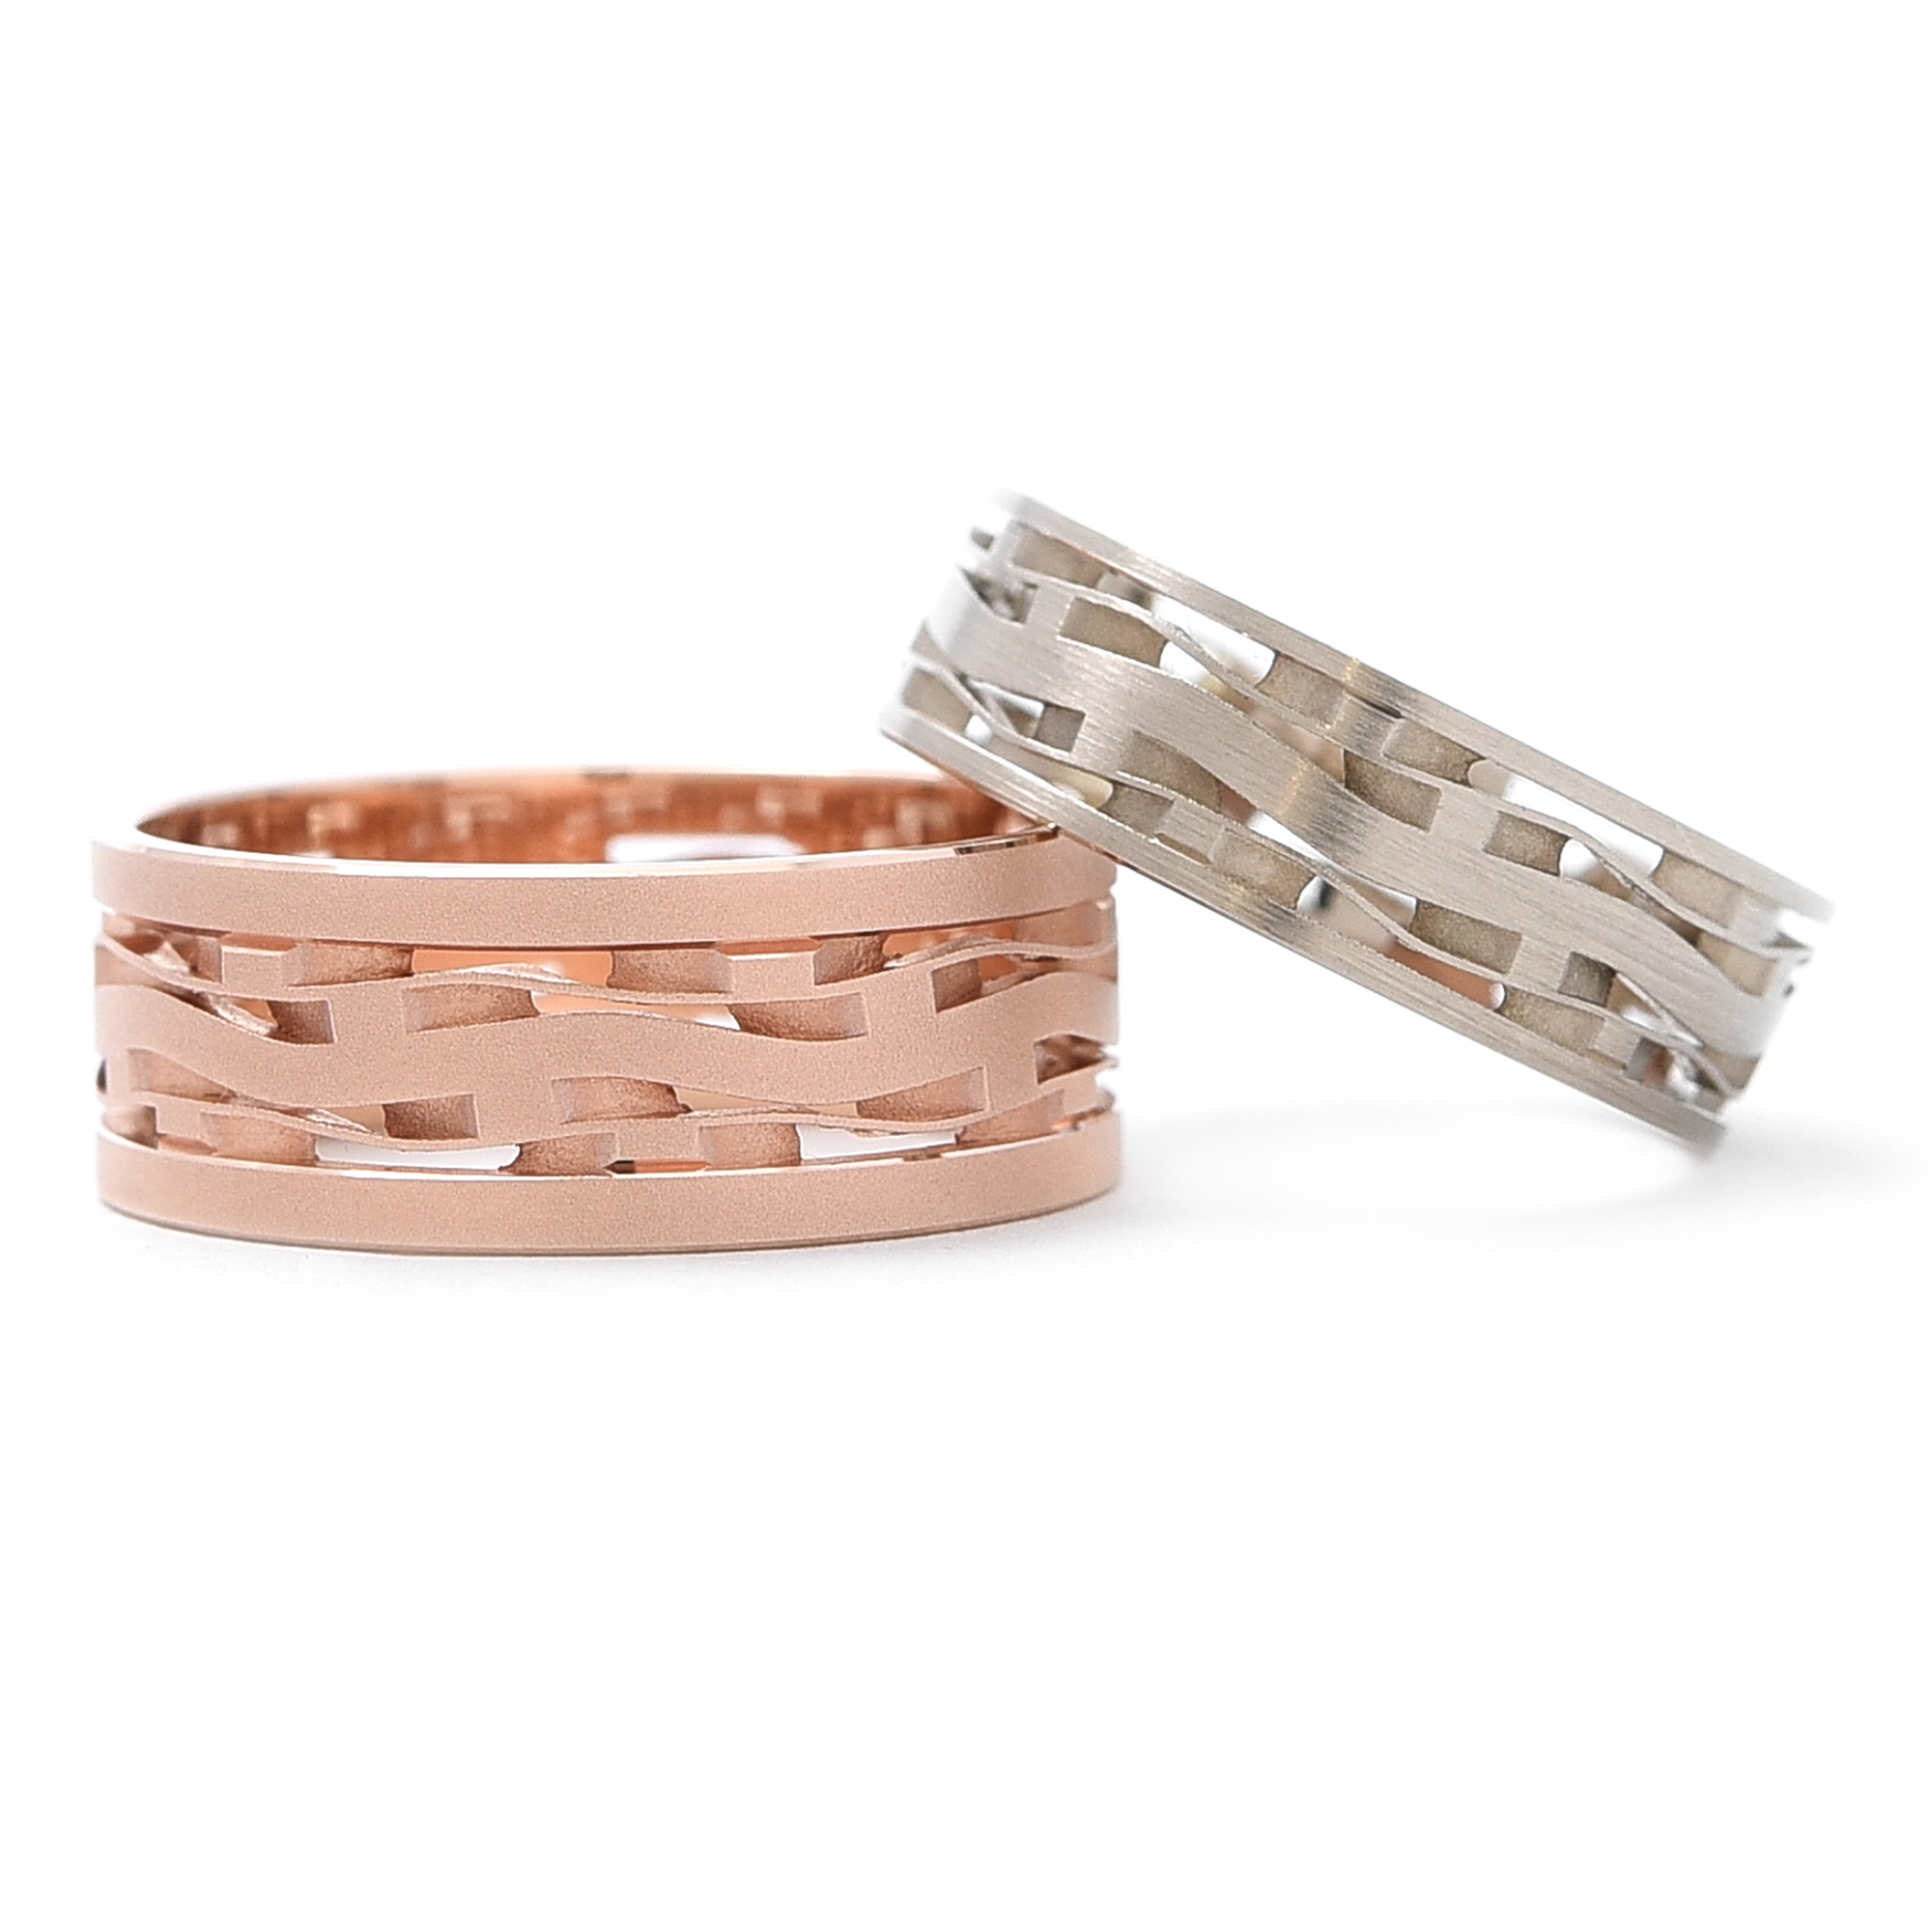 輪高崎工房の結婚指輪|HR-112